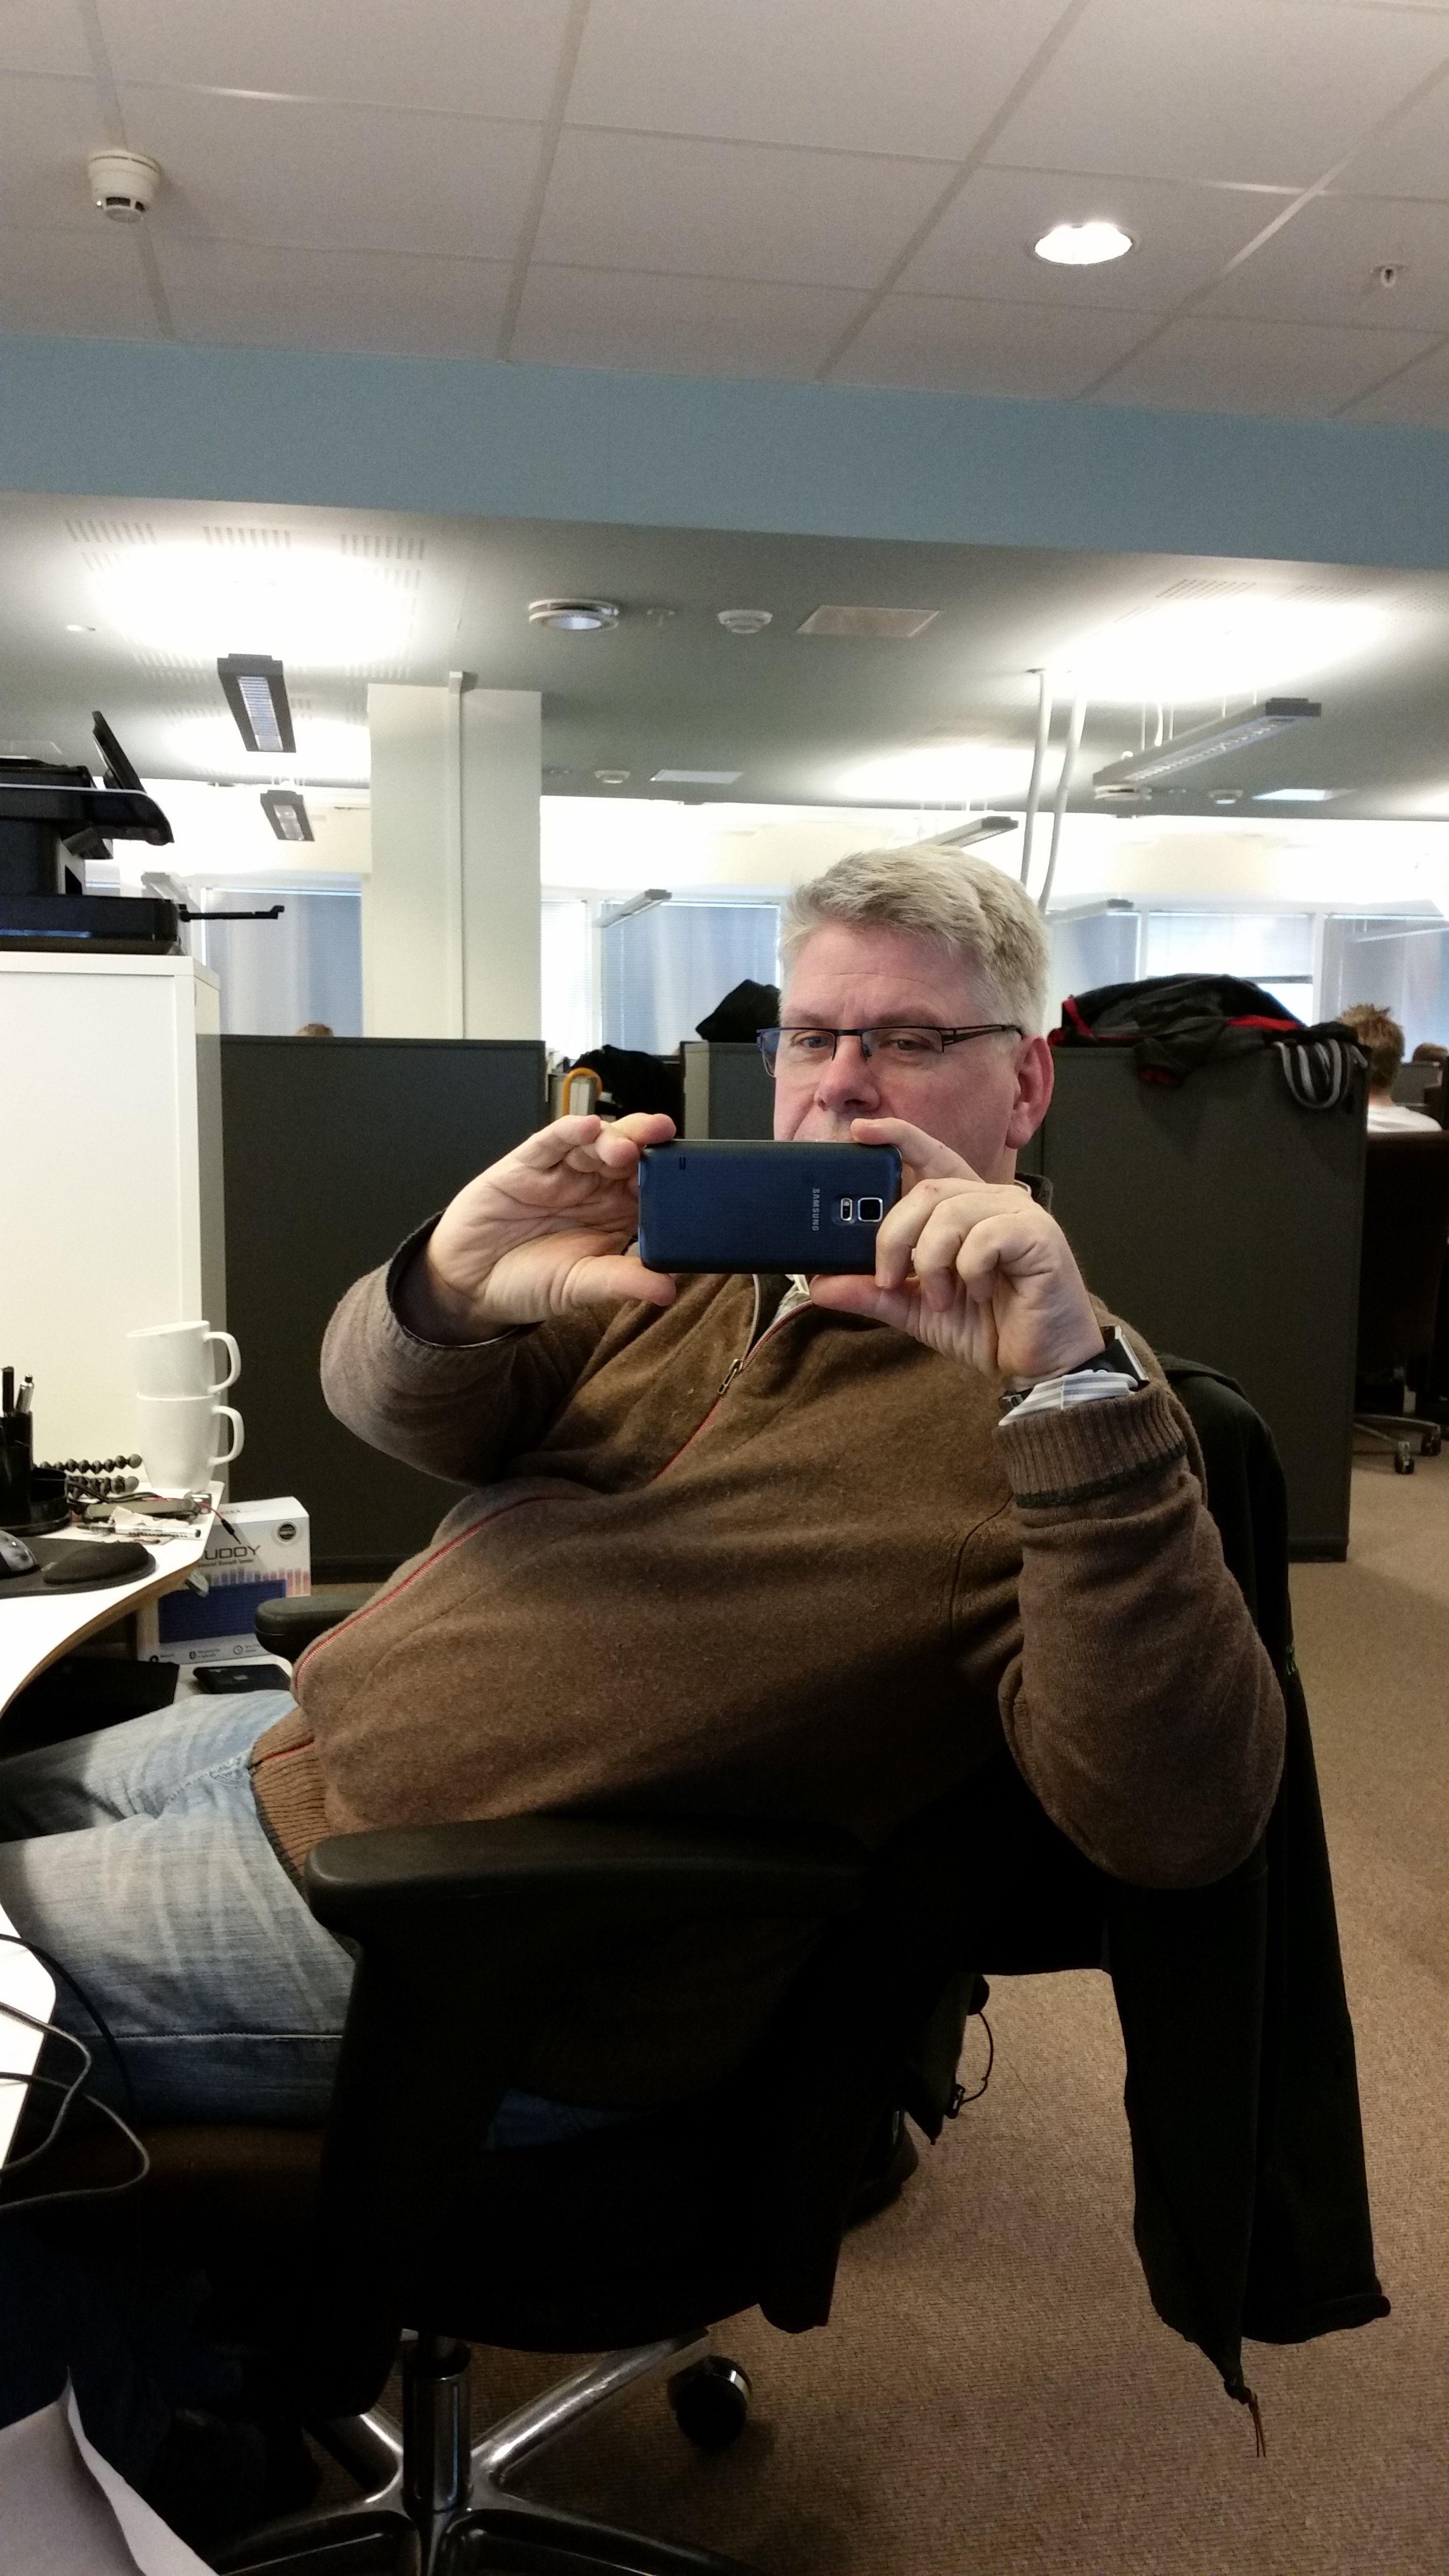 Testbilde Galaxy S5: Innendørs, god belysning